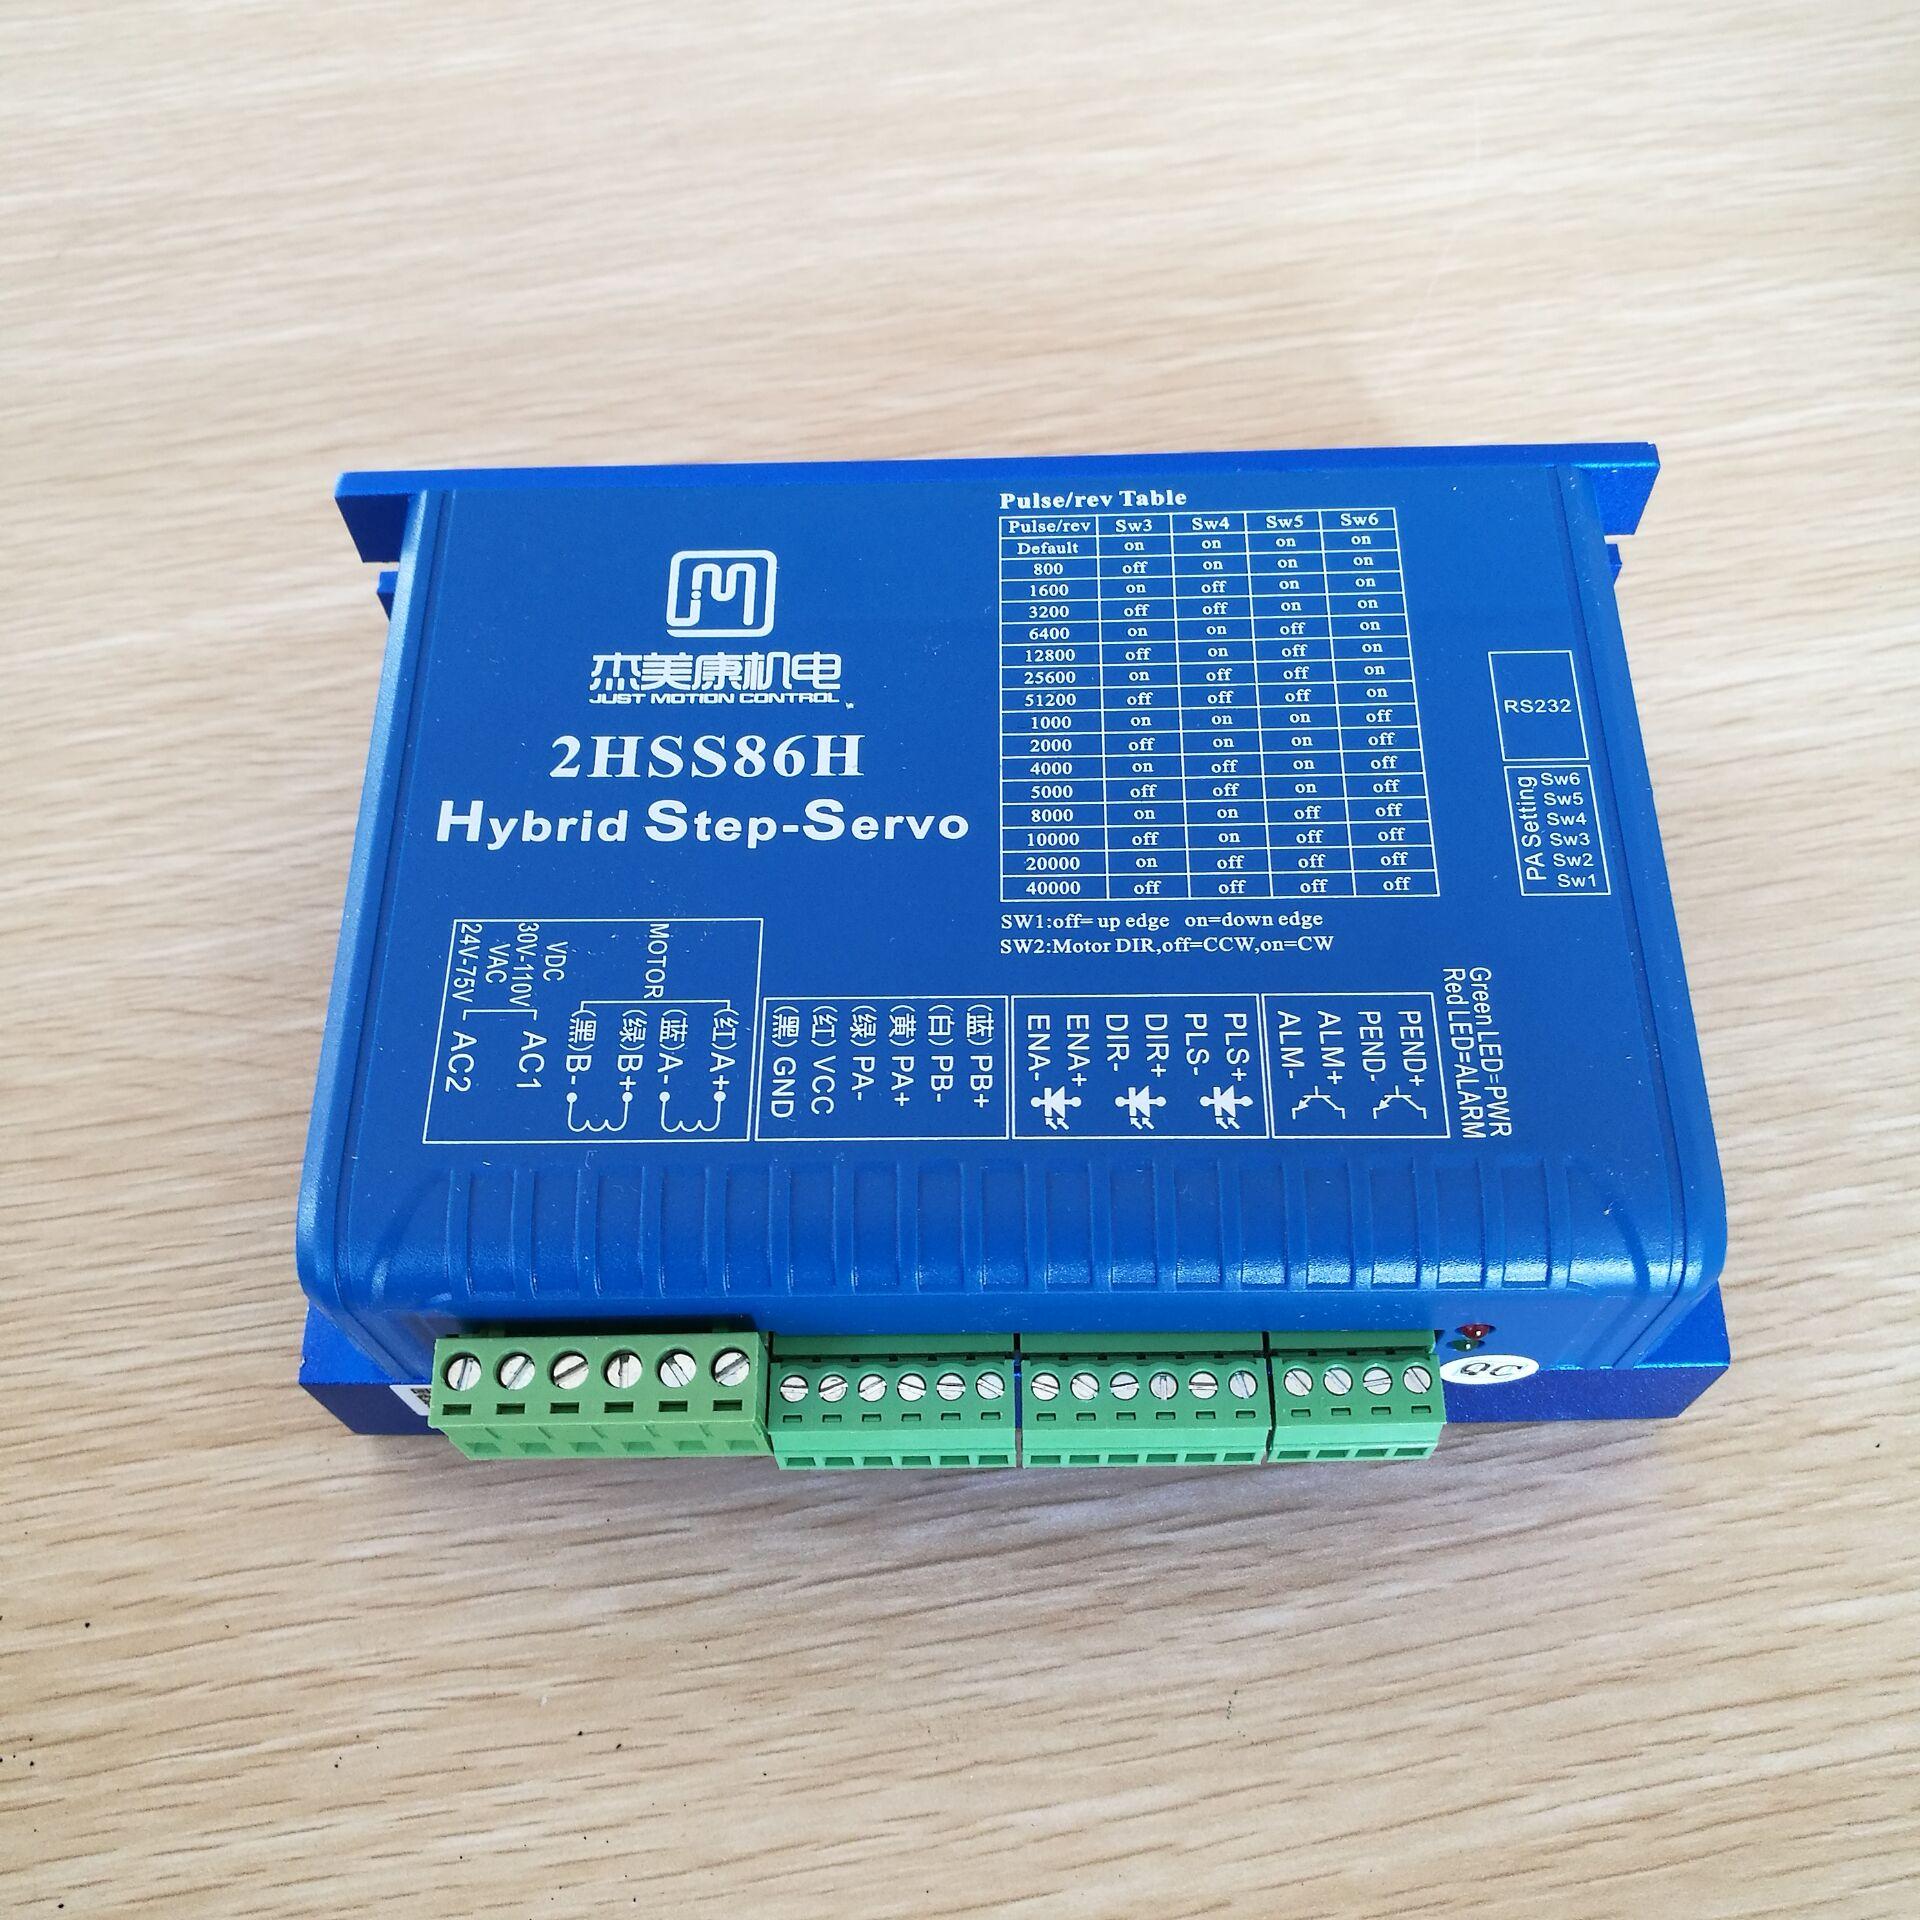 Controlador JMC 2HSS86H 24V-75VAC 30-110VDC 6A JMC 2HSS86H para motor nema 34, servocontrolador de pasos de bucle cerrado de 2 fases